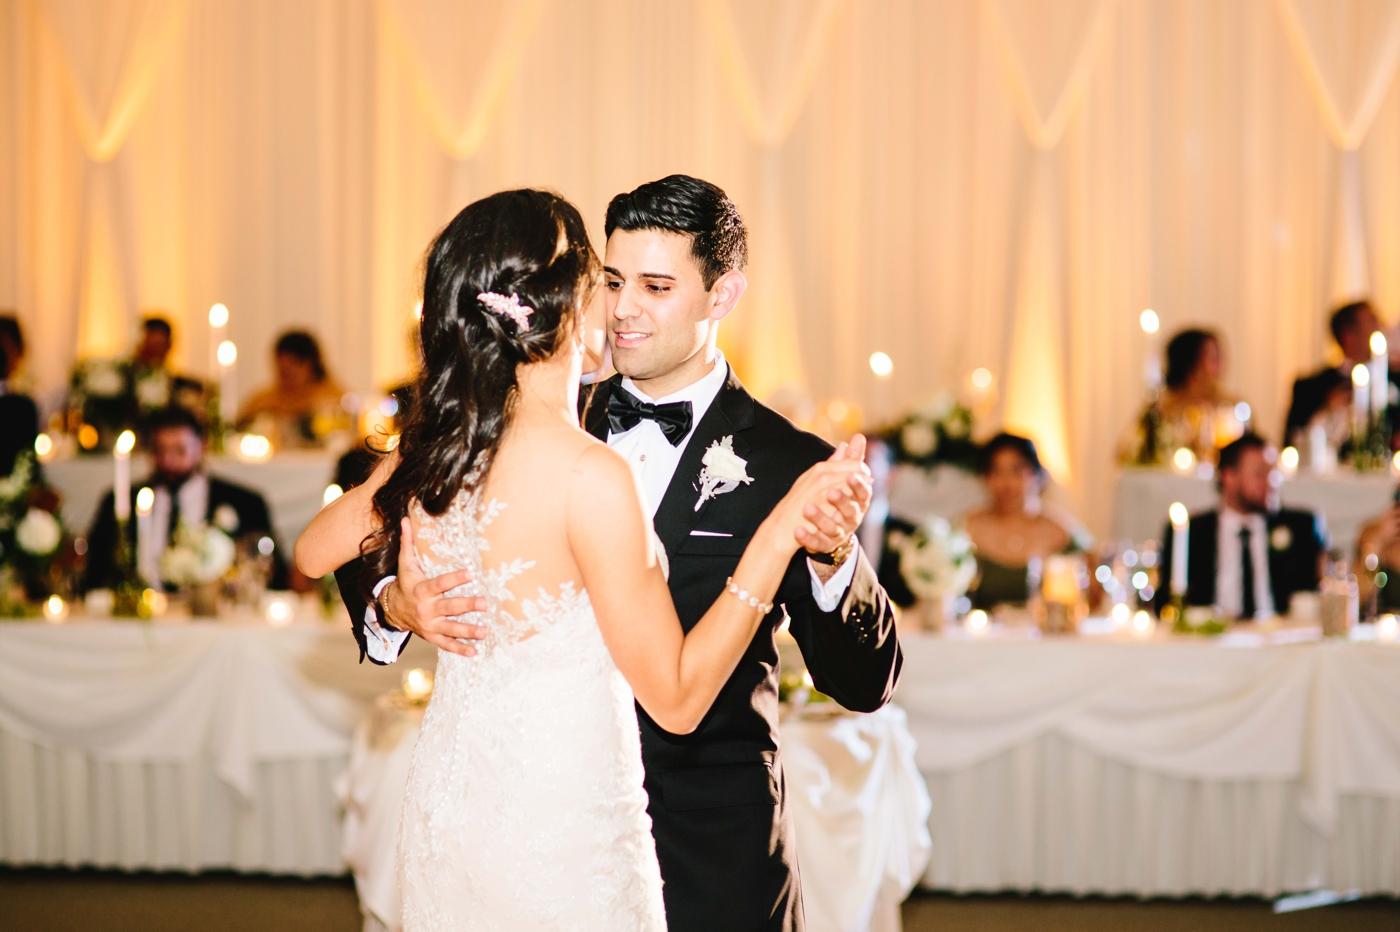 chicago-fine-art-wedding-photography-alfano26